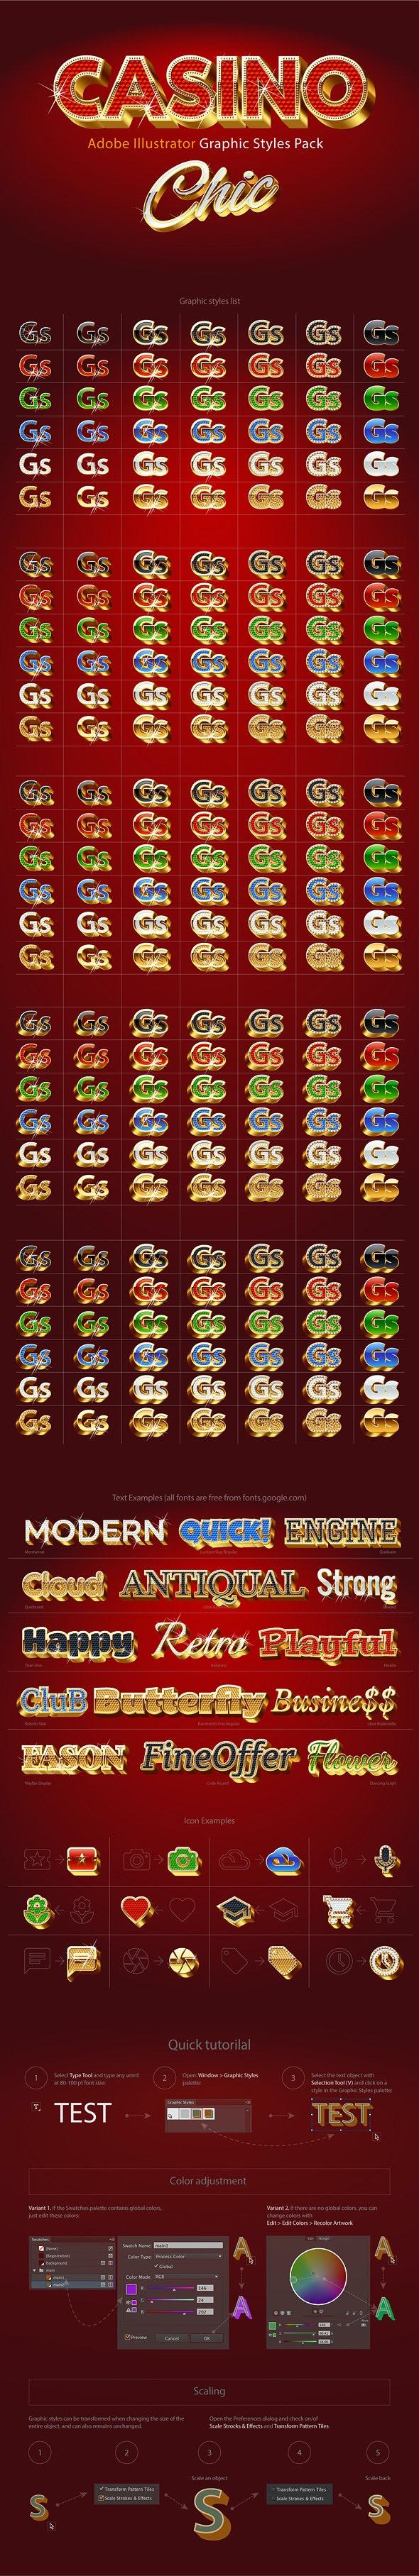 Adobe Illustrator Graphic Styles Extra Gold 3D - Styles Illustrator